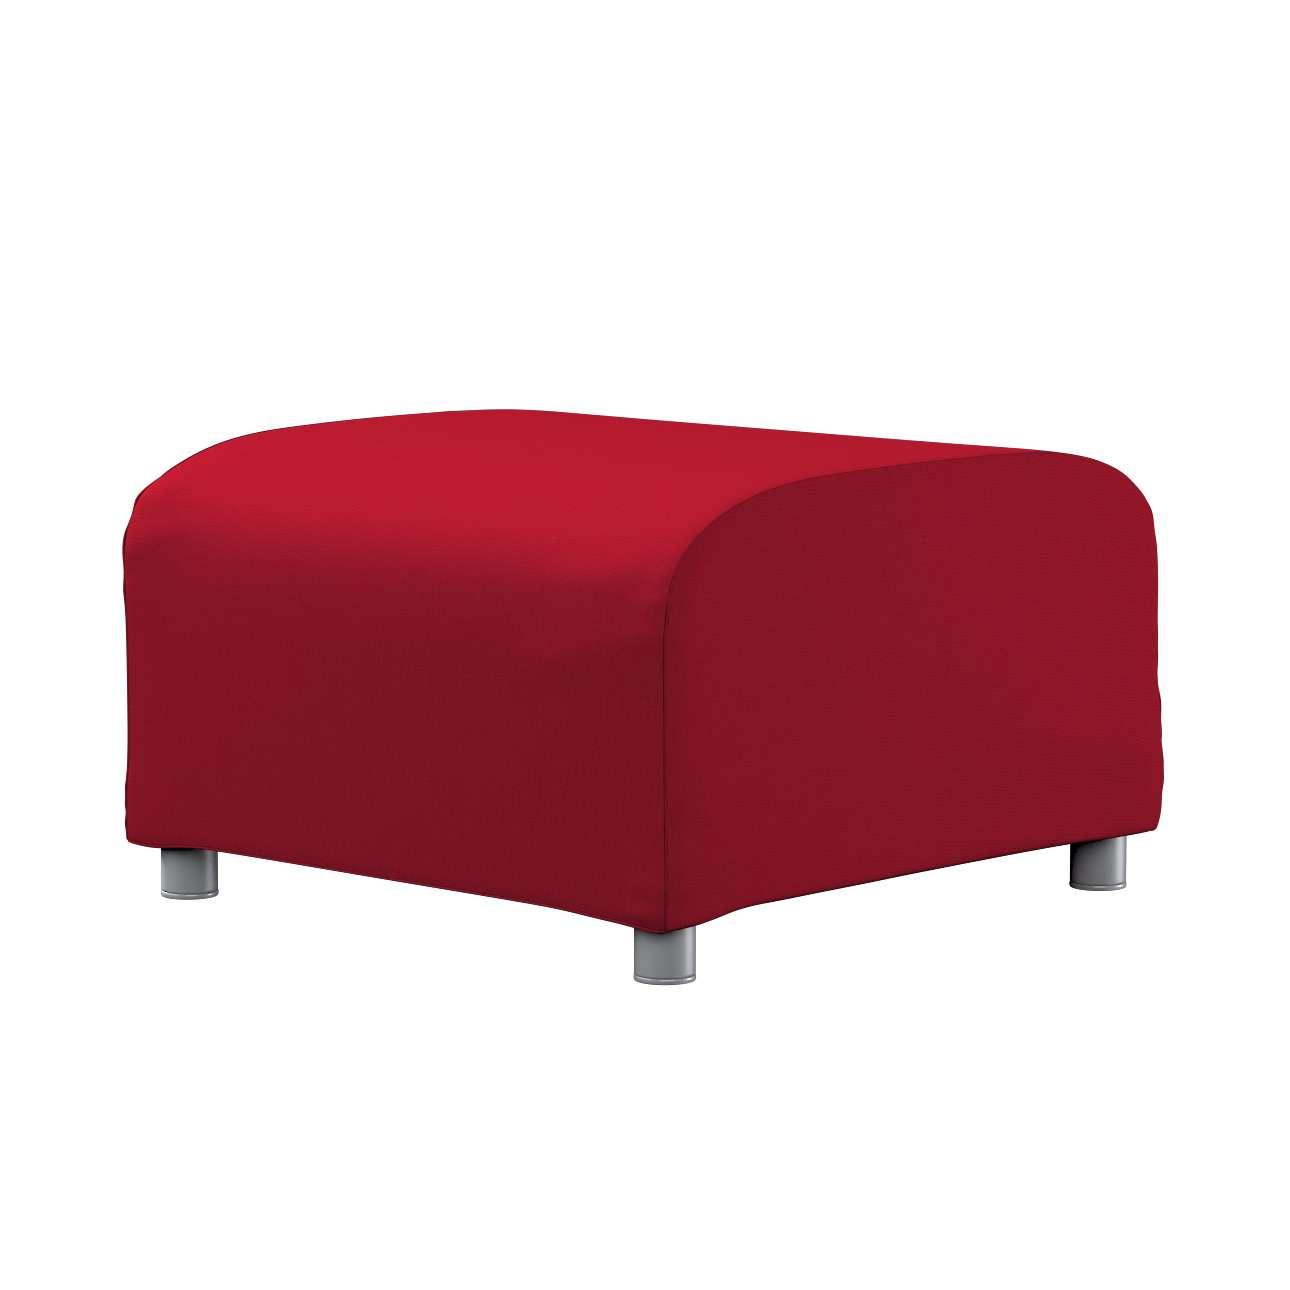 KLIPPAN pufo užvalkalas Klippan footstool cover kolekcijoje Etna , audinys: 705-60